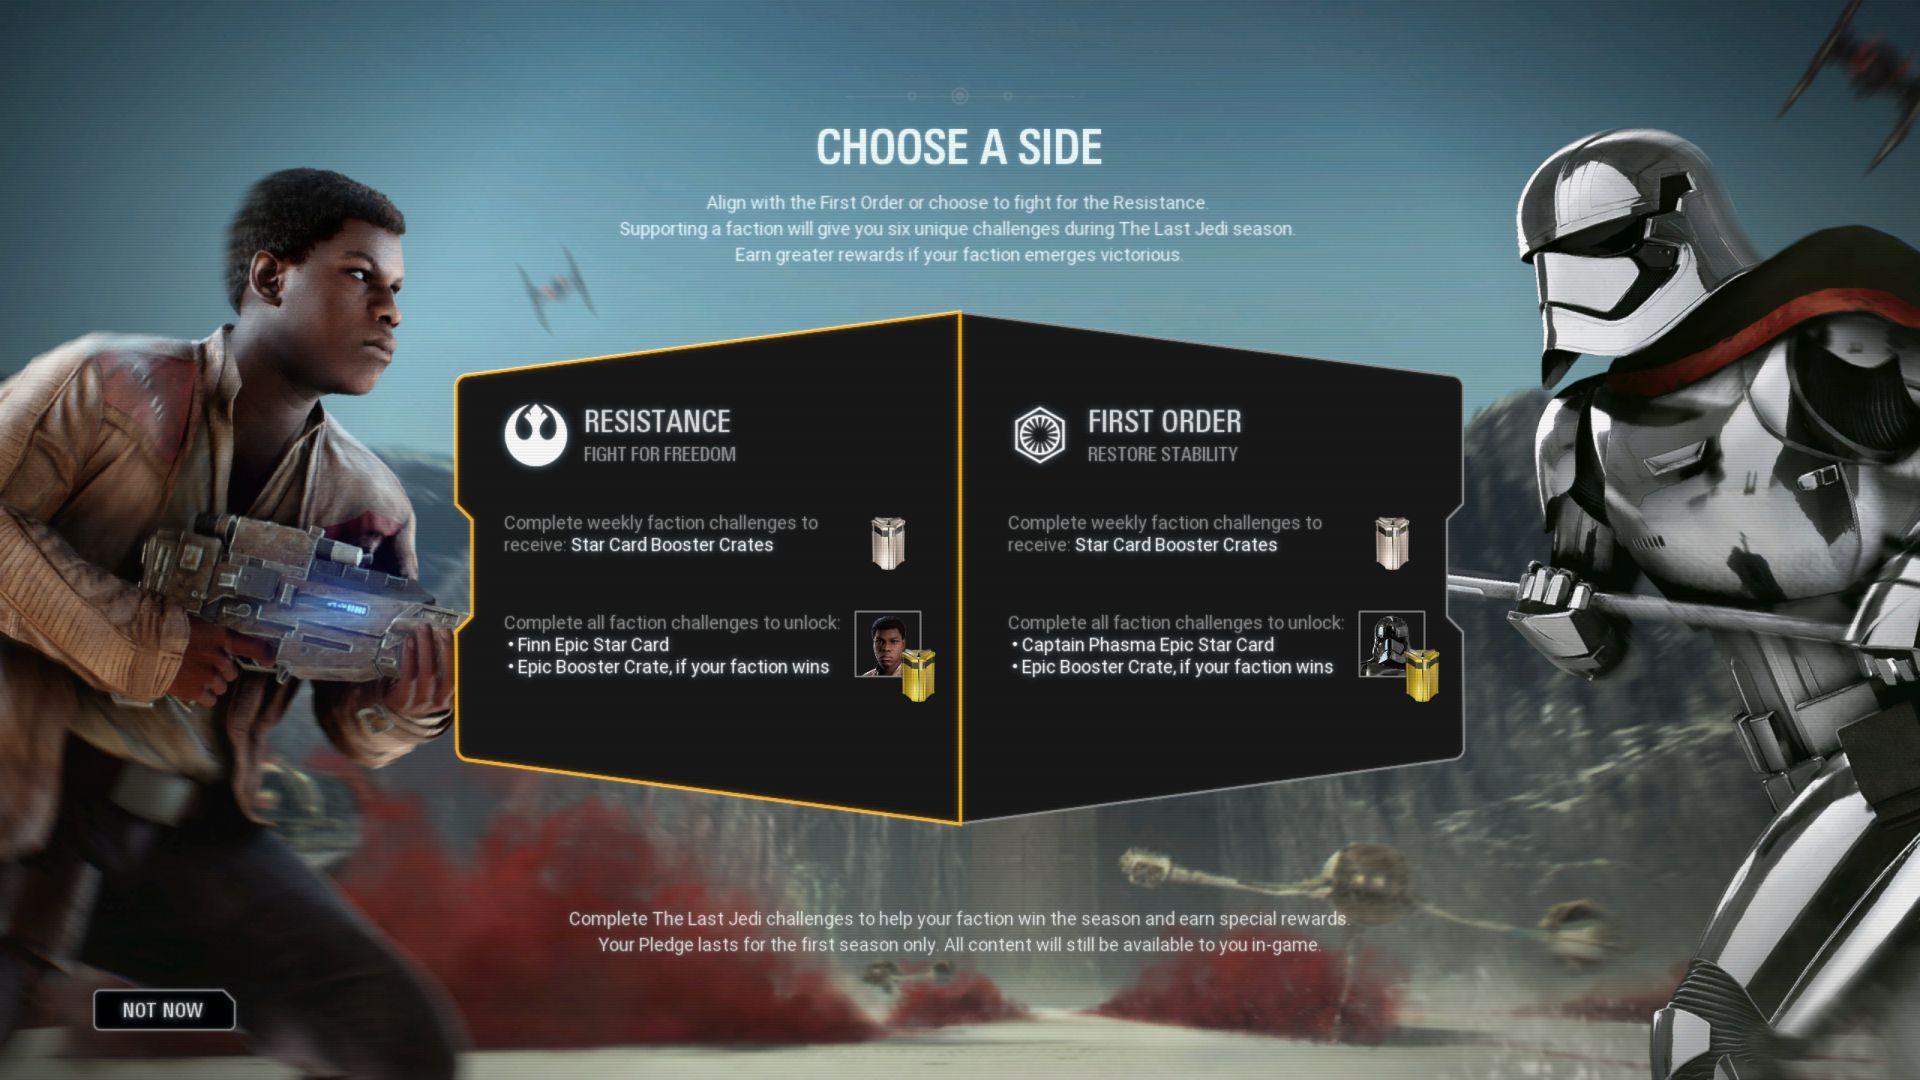 Star-wars-battlefront-2-last-jedi-season-01